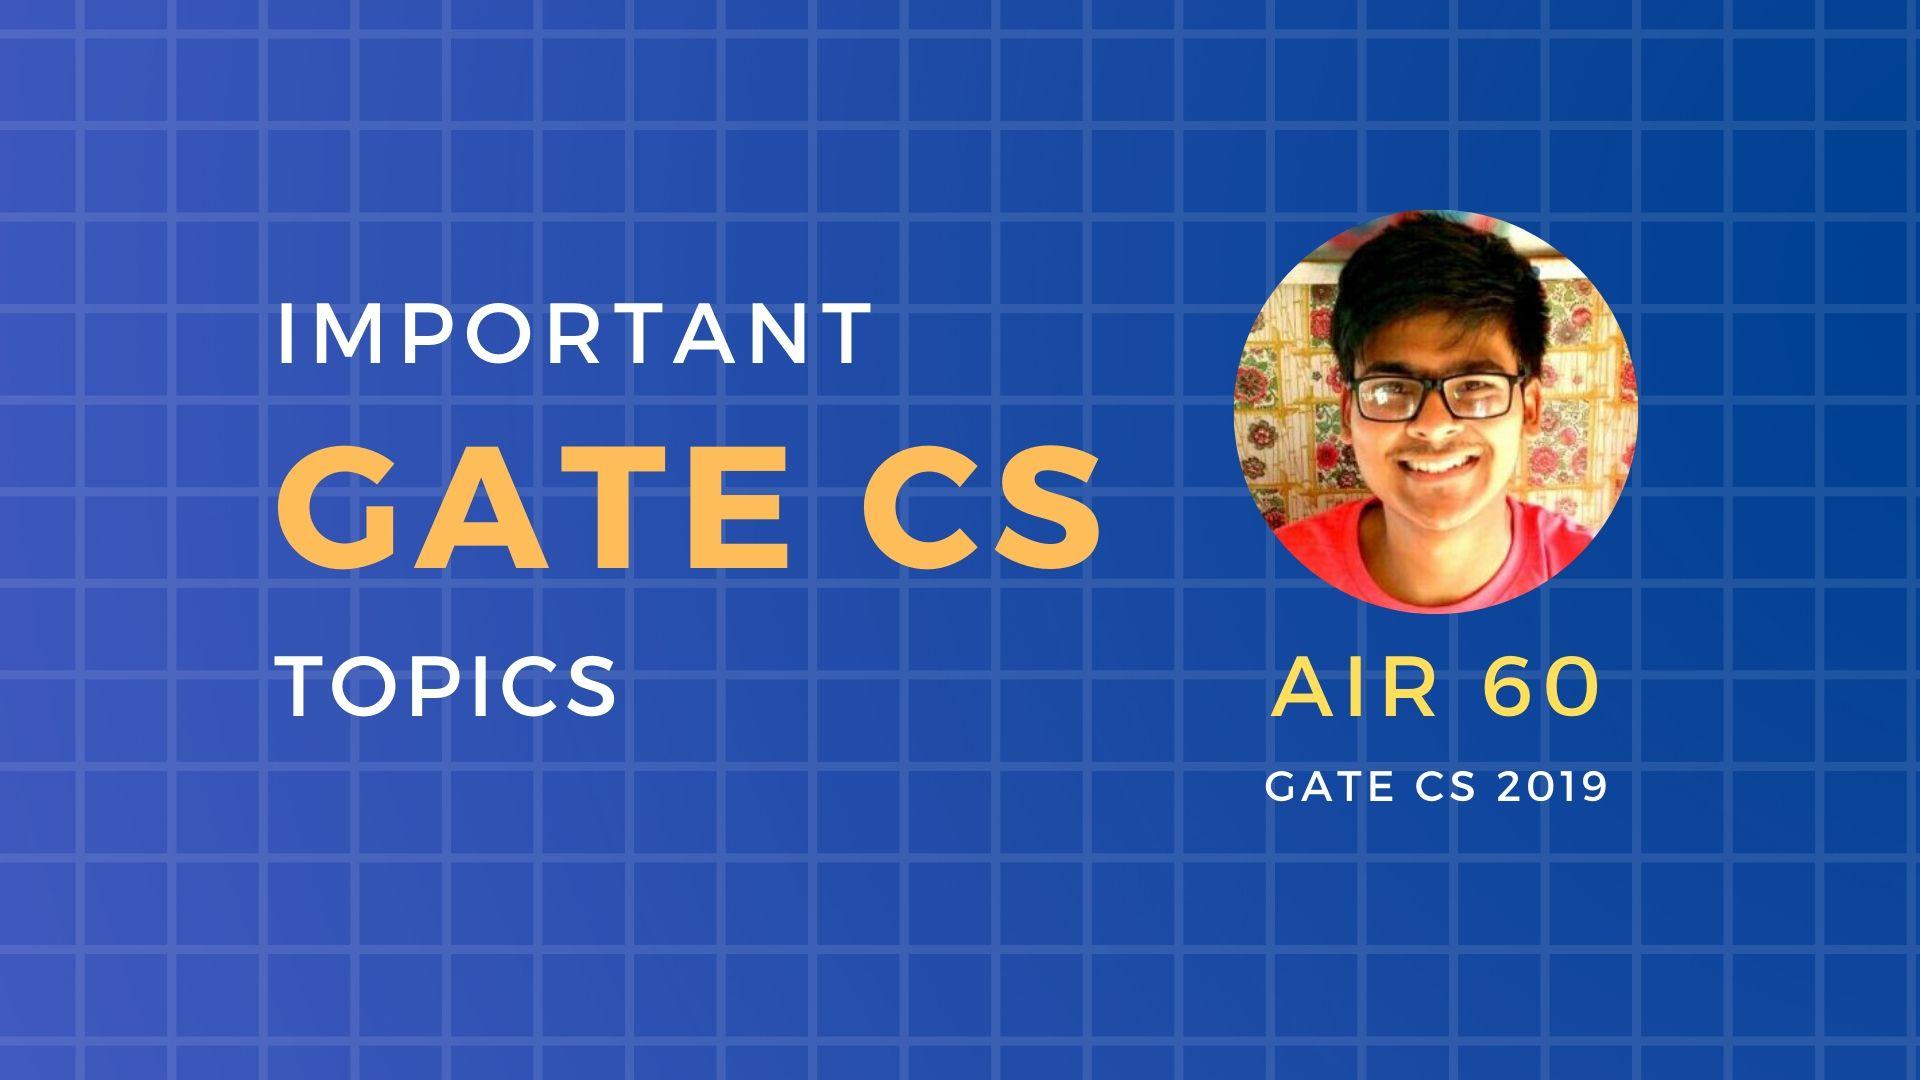 Important gate CS topics